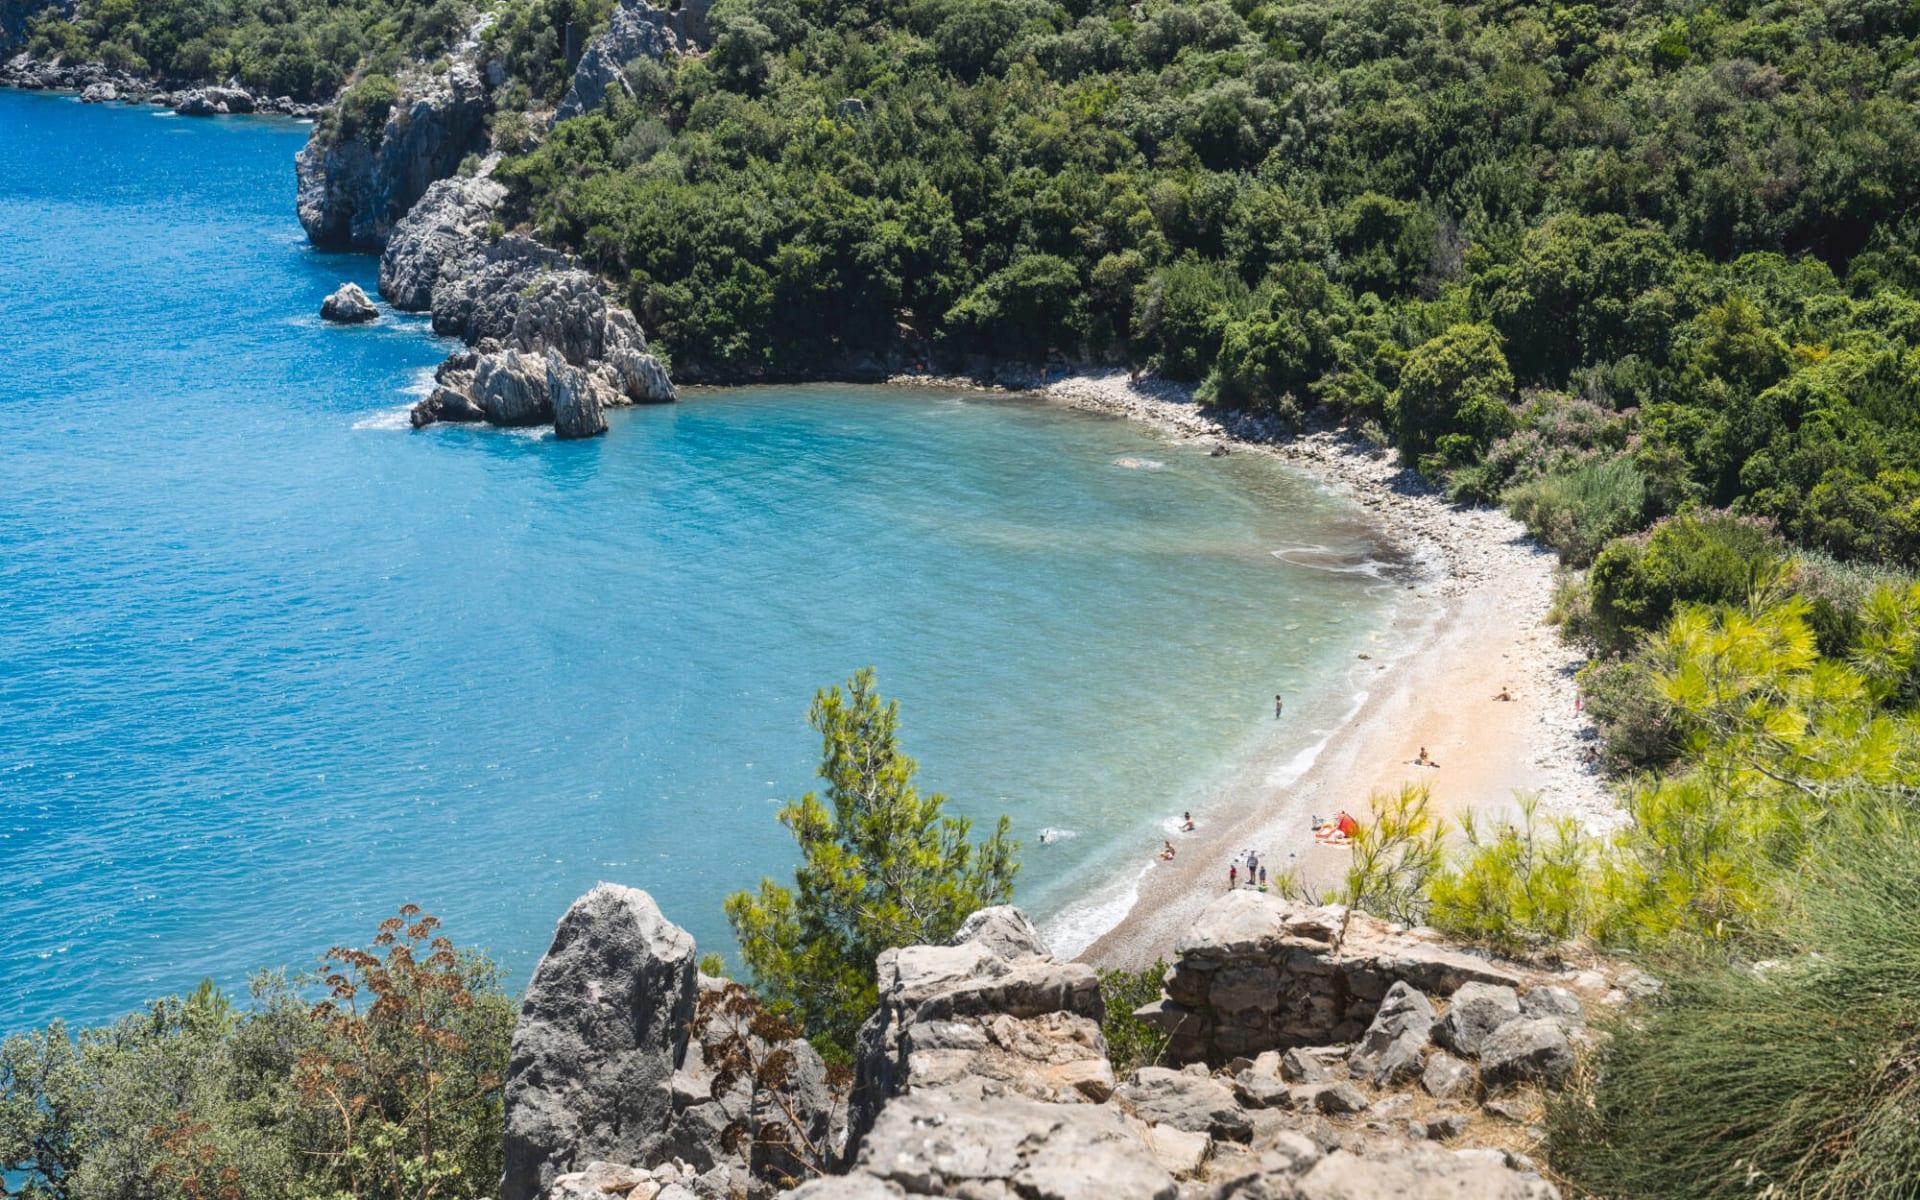 Badeferien im Güral Premier Belek ab Antalya: kleiner Strand_Türkei